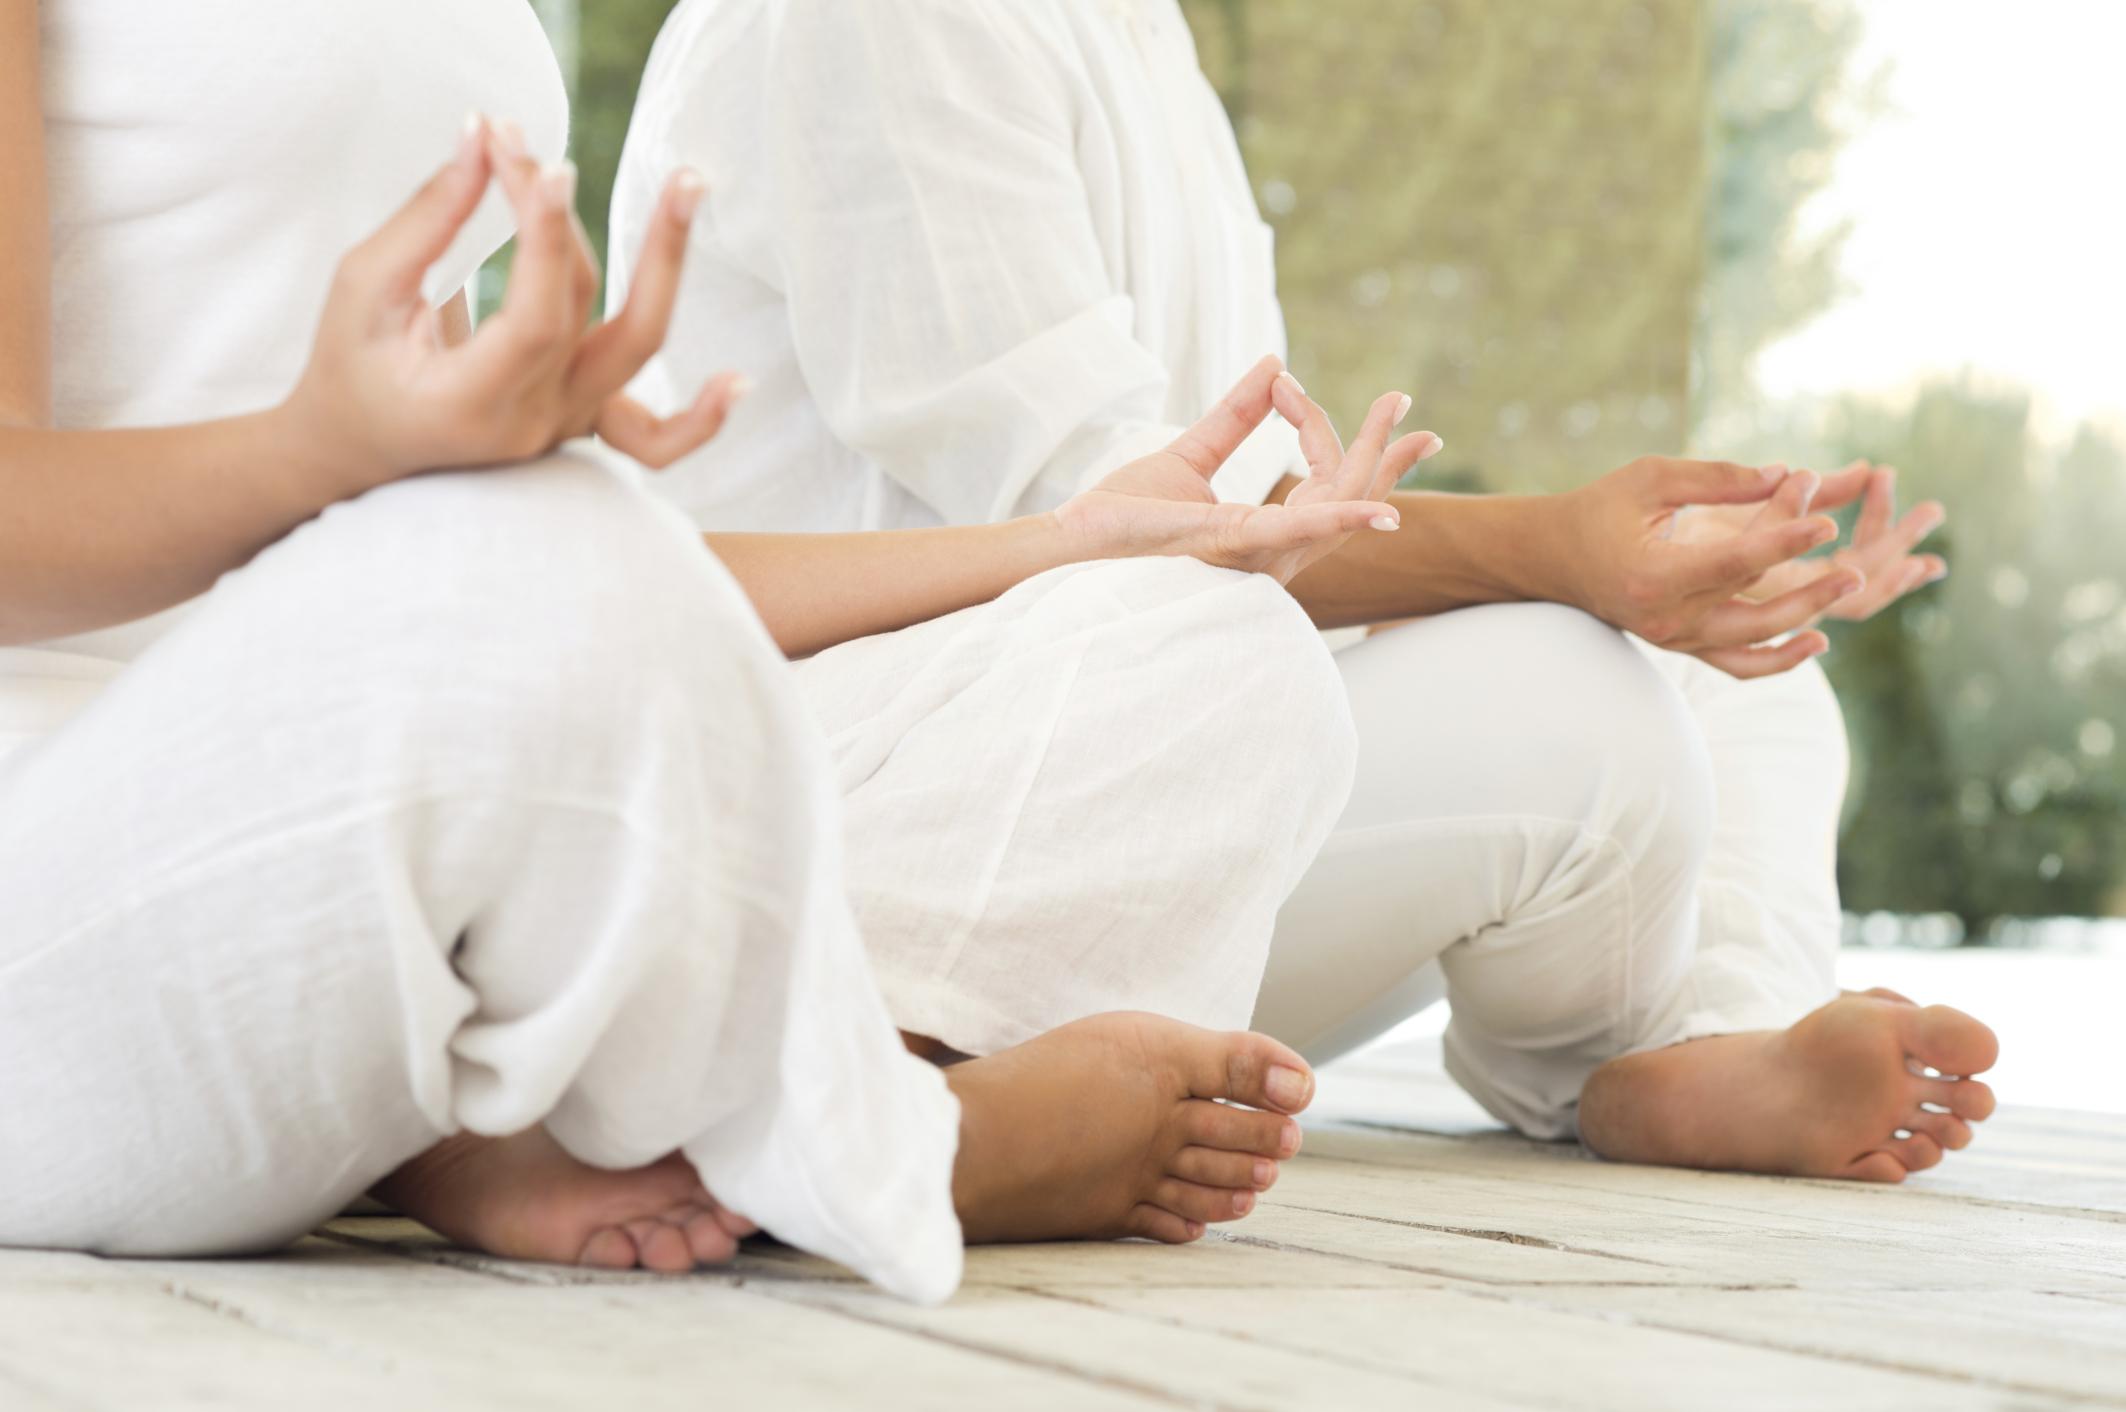 Kundalini – The Yoga Style You've Probably Never Heard Of